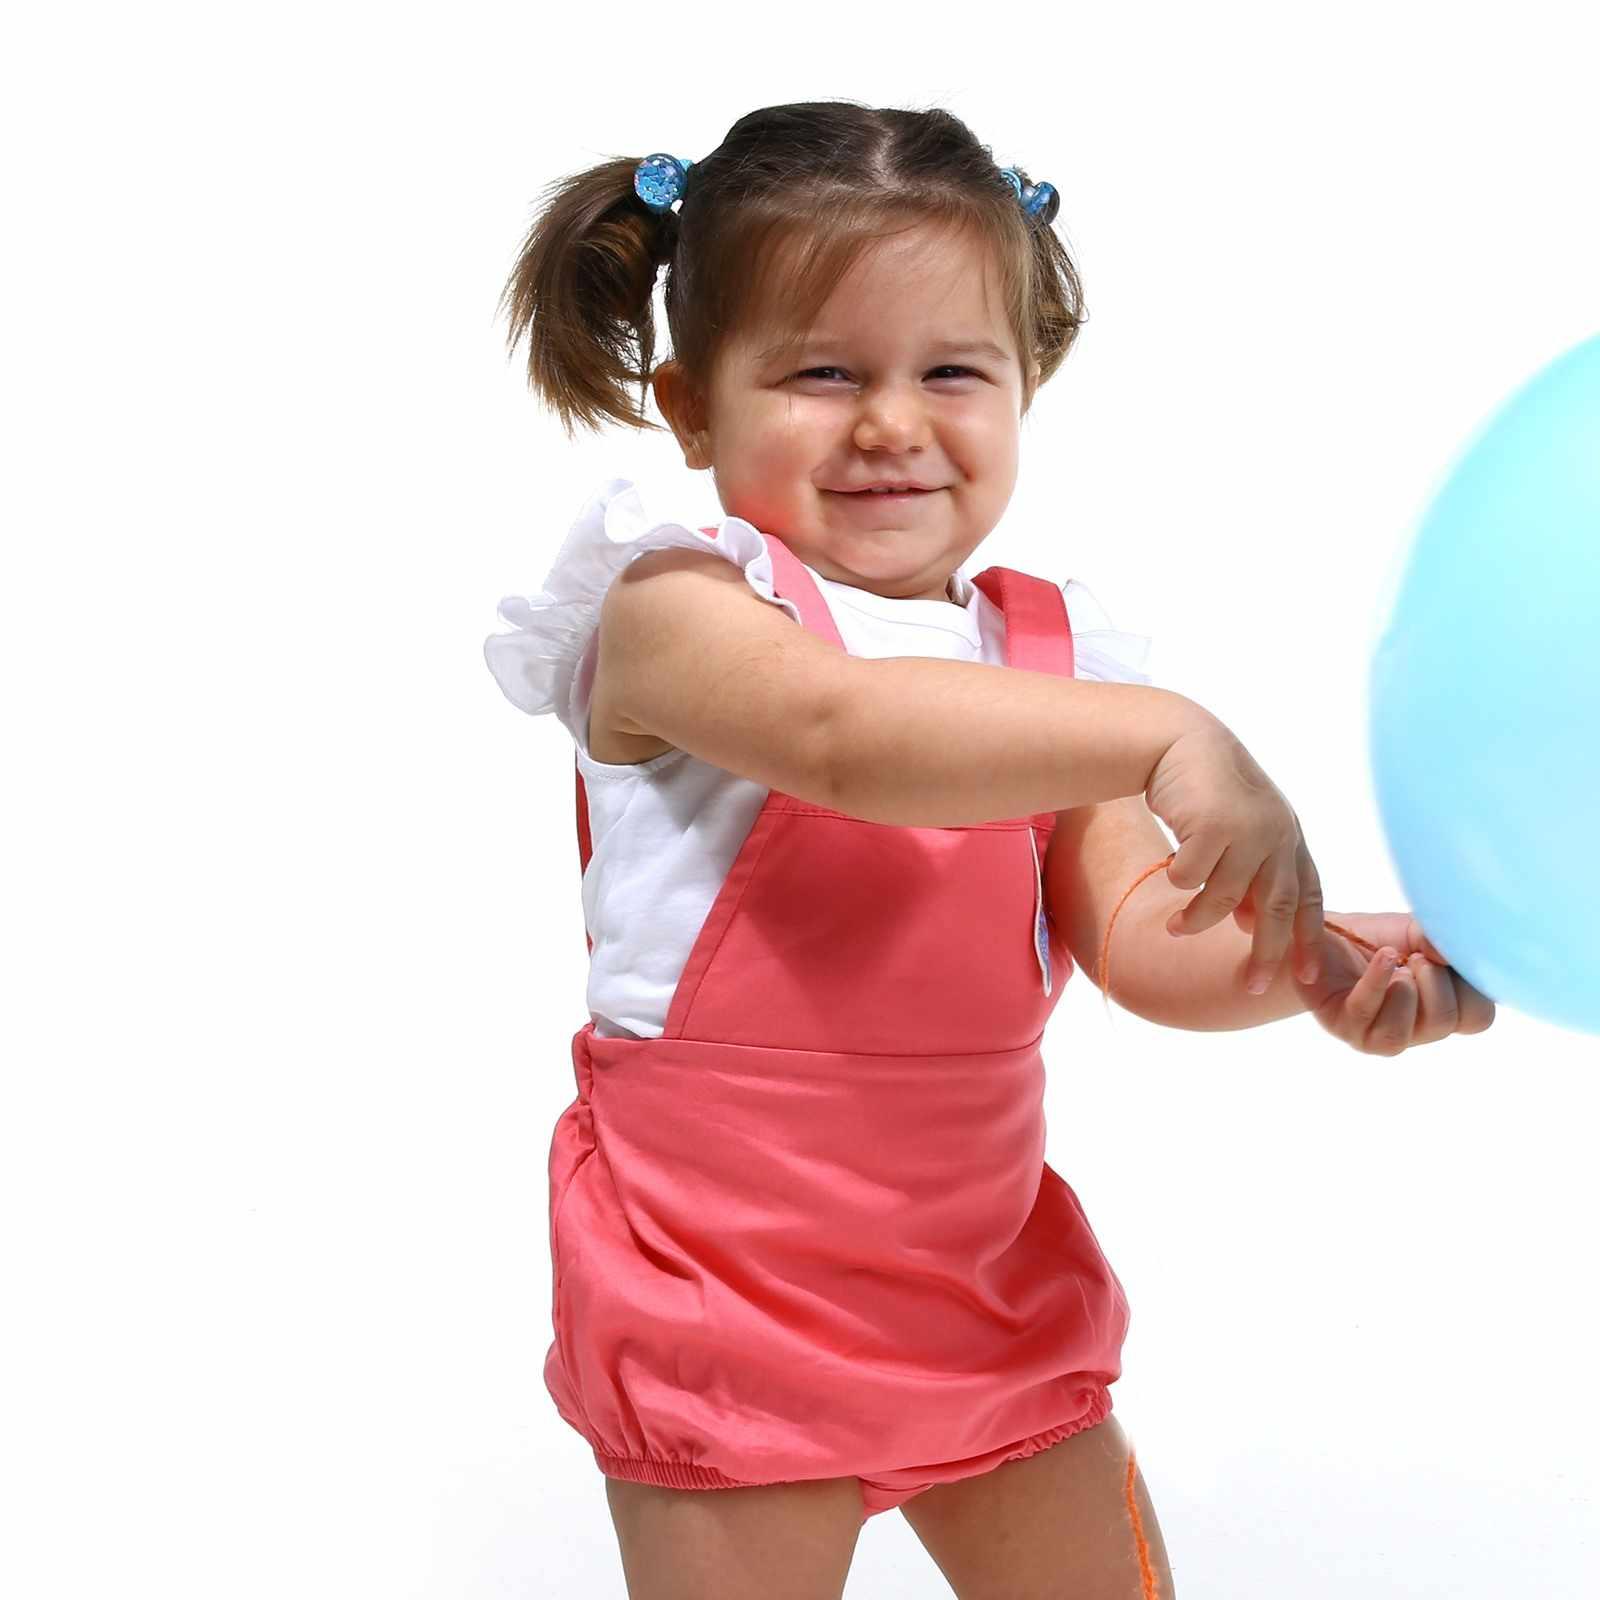 Ebebek HelloBaby Vis Thema Baby Meisje Bodysuit Jumpsuit Tshirt Set